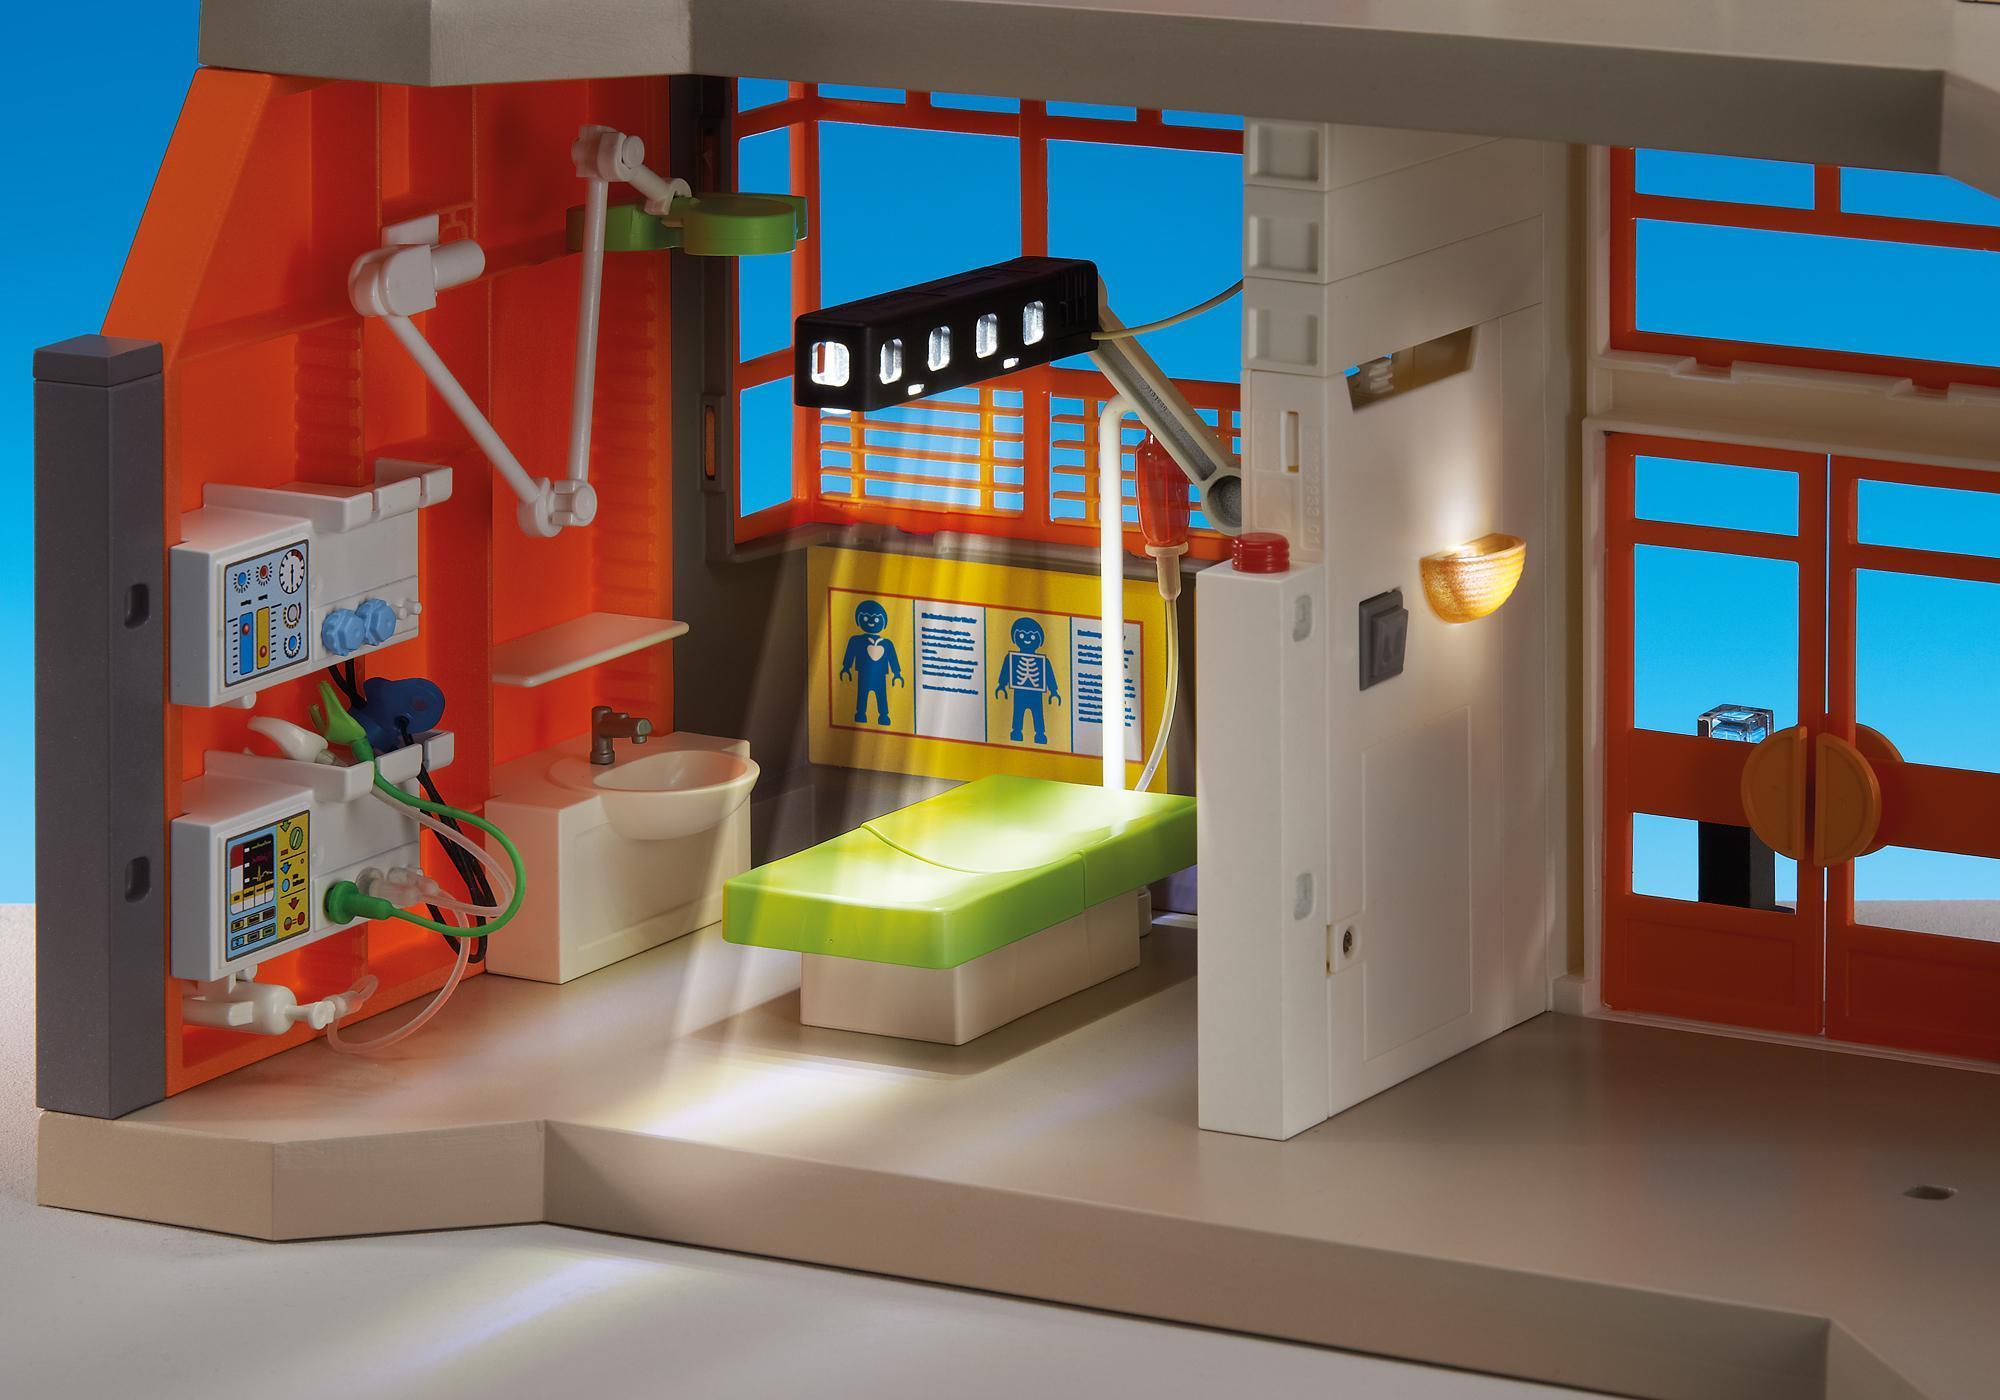 http://media.playmobil.com/i/playmobil/6446_product_extra1/Set de Iluminación para el Hospital Infantil